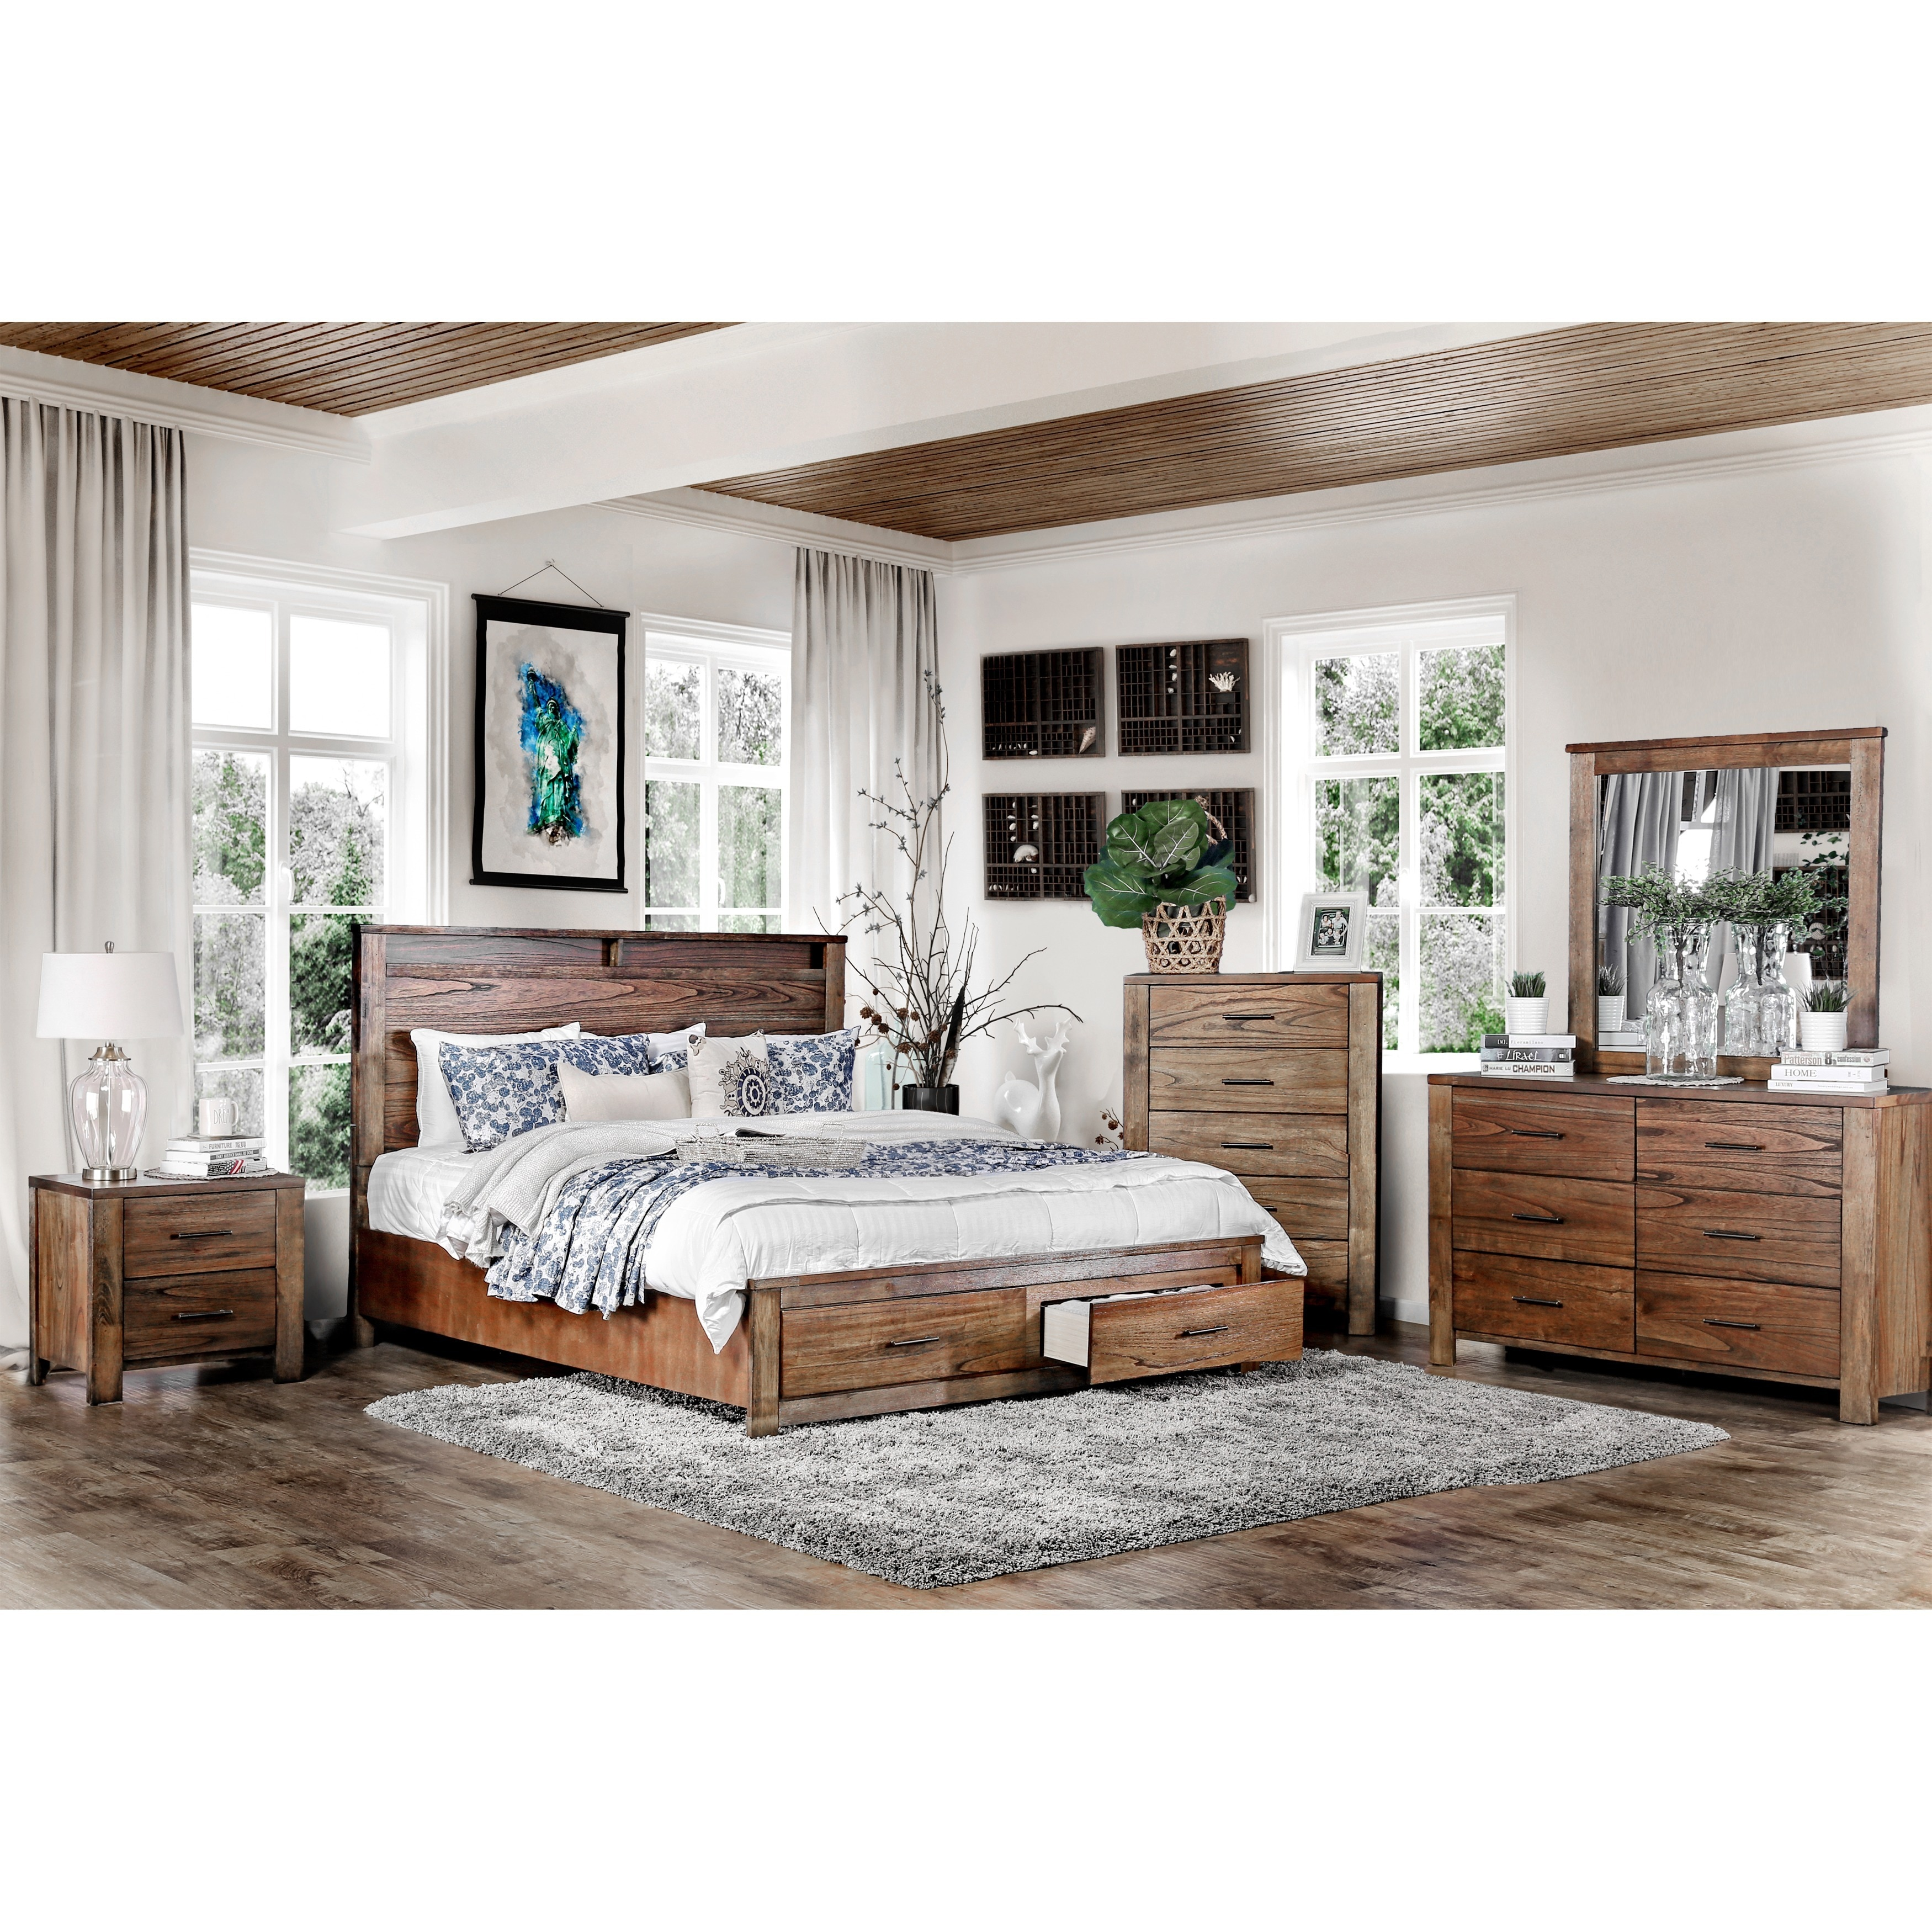 Shop Furniture Of America Casso Rustic Oak Storage Platform Bed